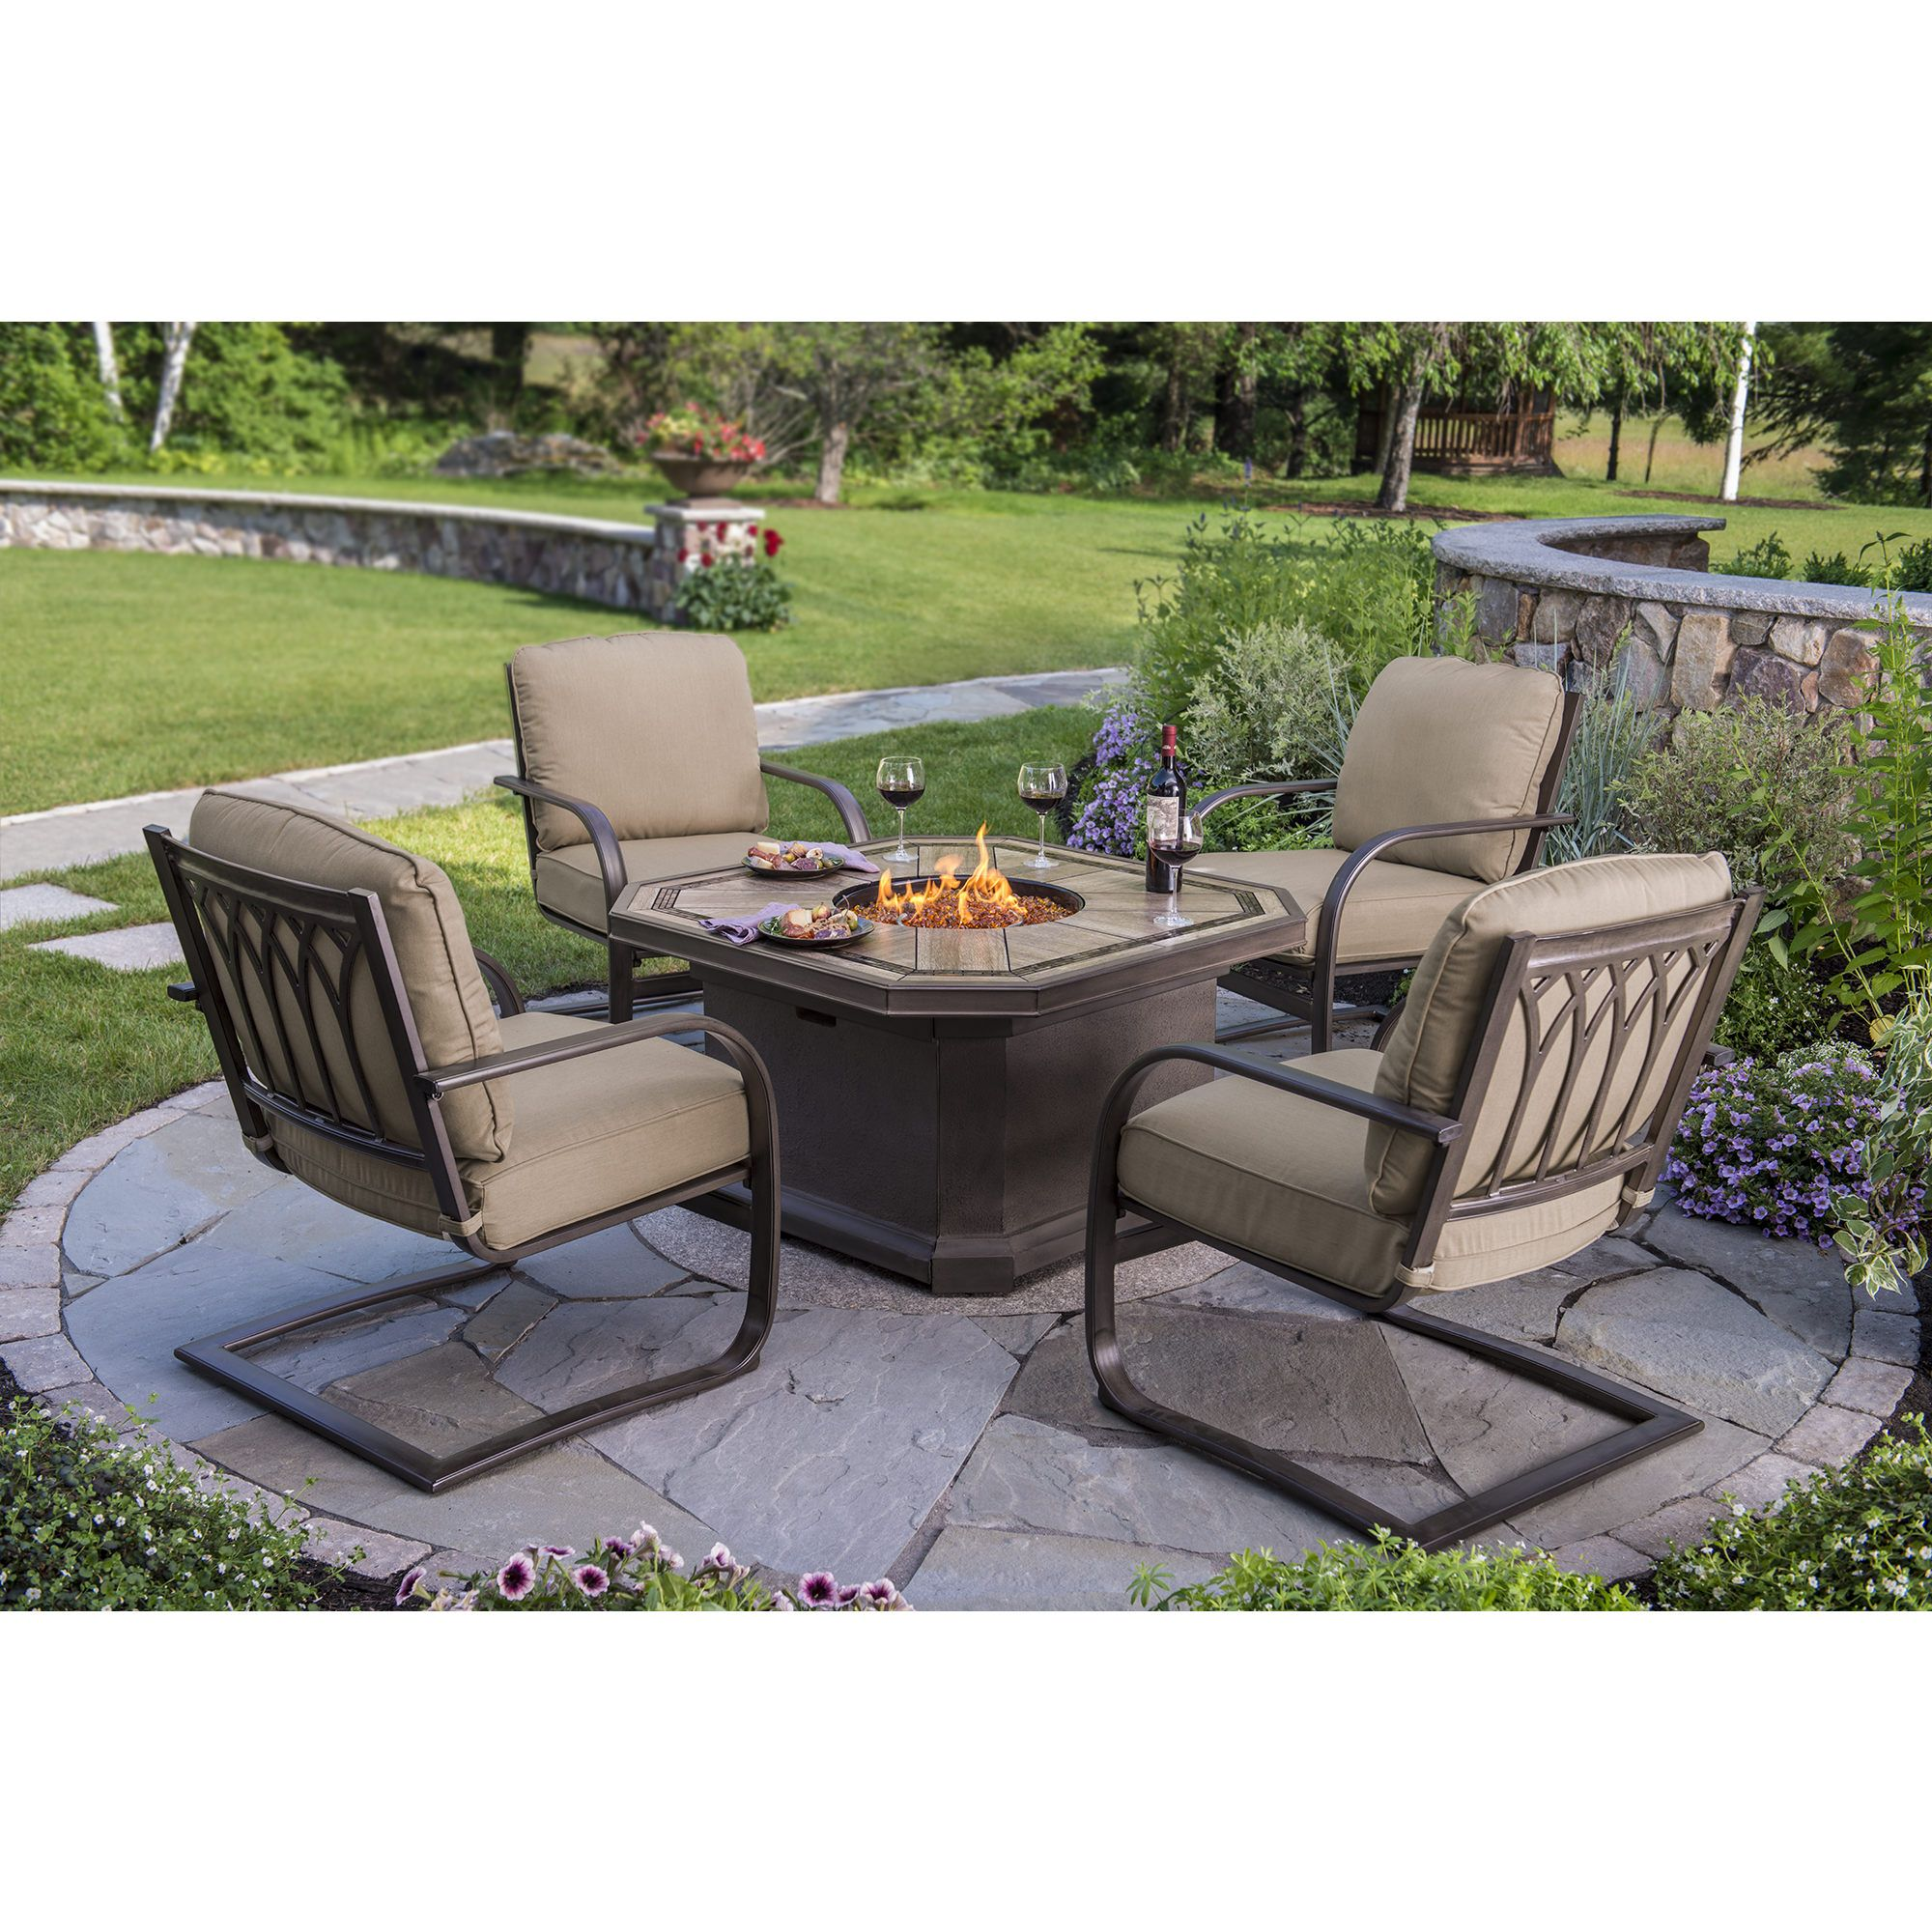 Berkley Jensen 5 Piece Fire Pit Set With Spring Cushions Elegant